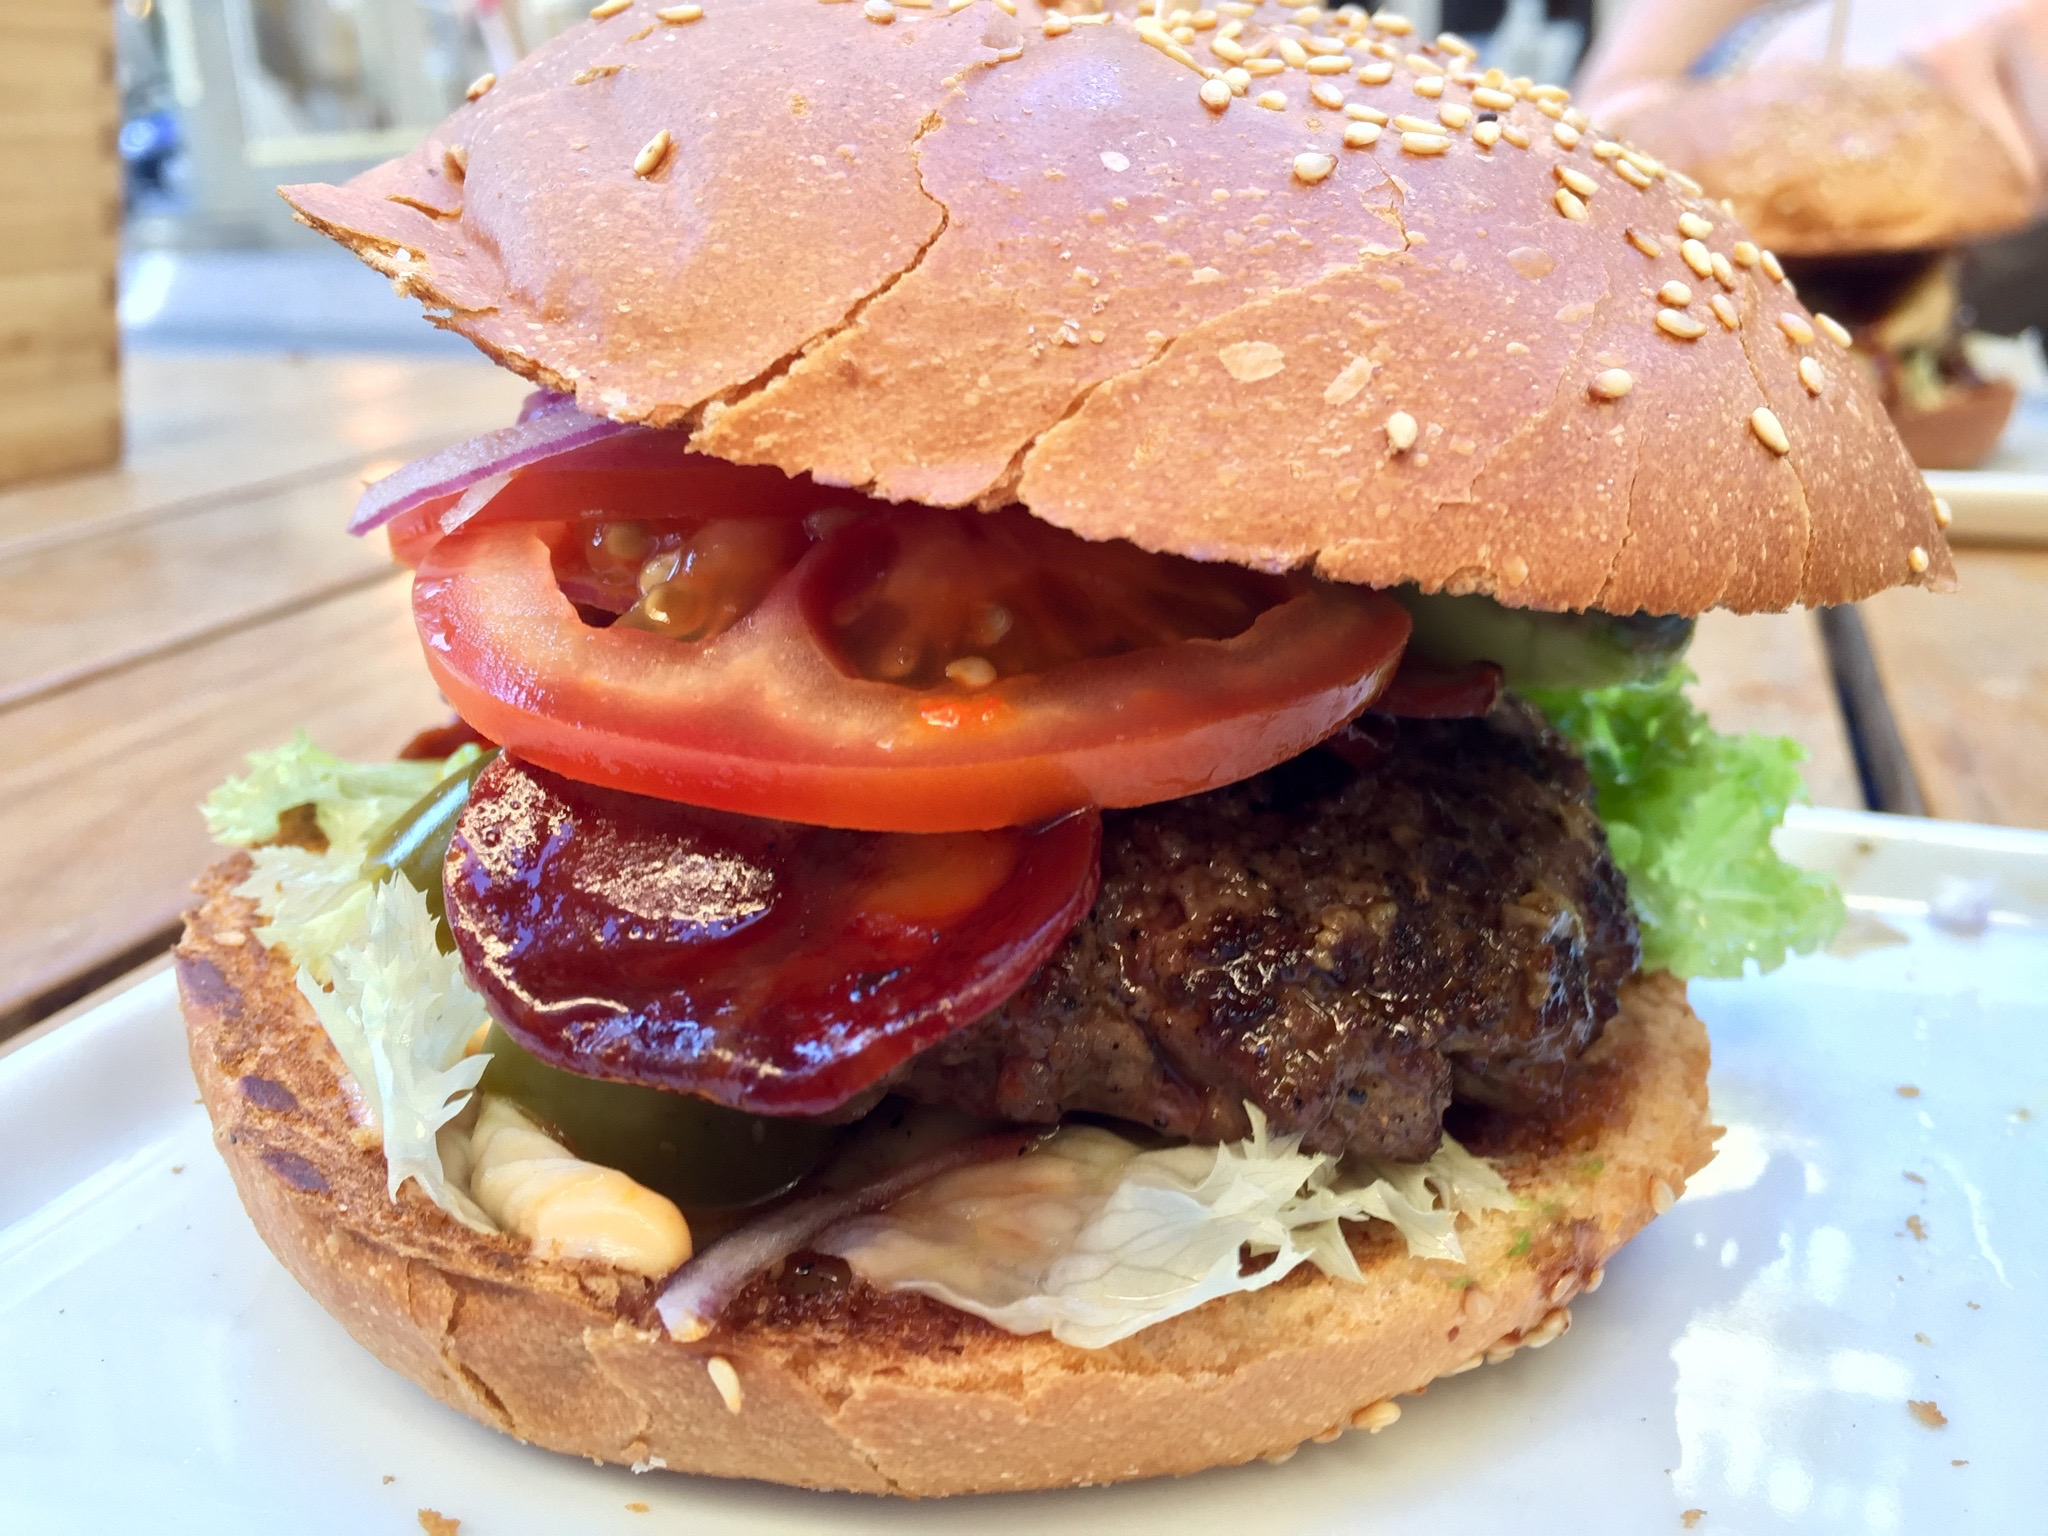 A side view of the Los Cojones Mexicanos burger